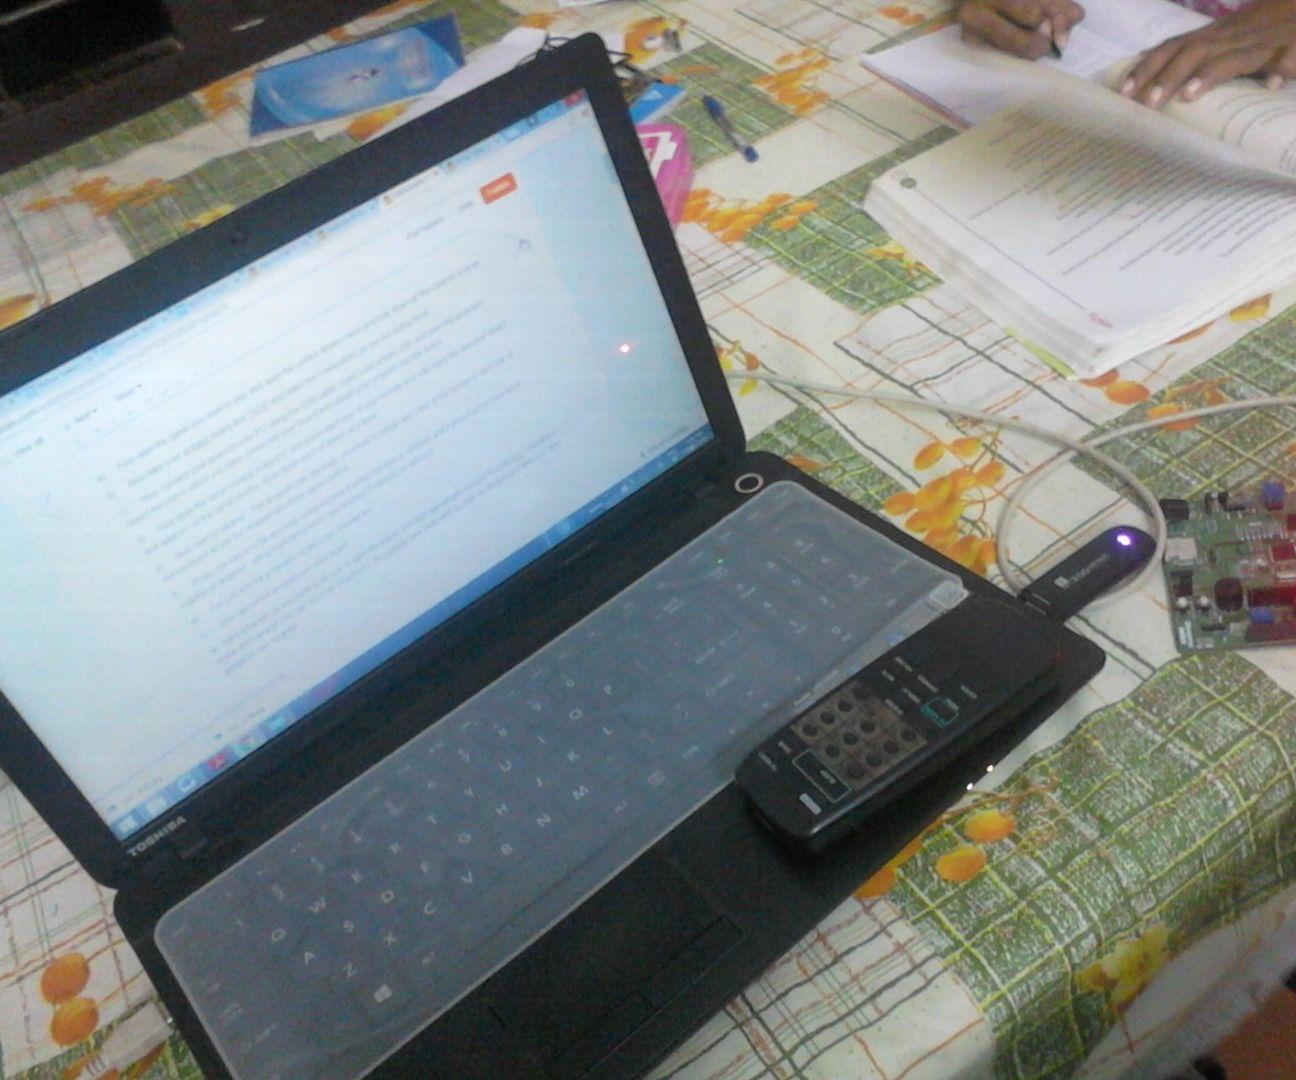 VLC Media Player control using IR remote